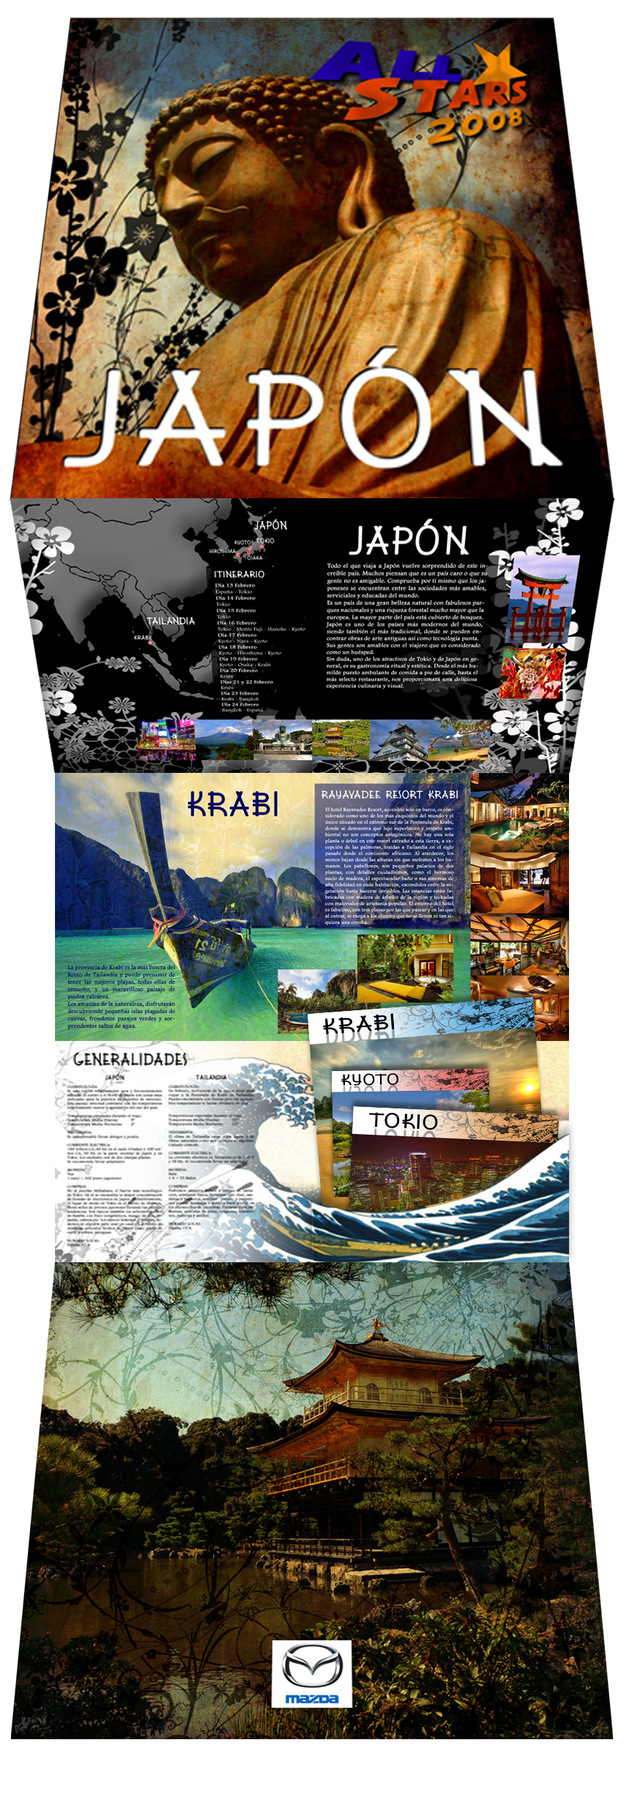 Juan Vega Martínez - Viaje superventas Japón y Krabi, Mazda